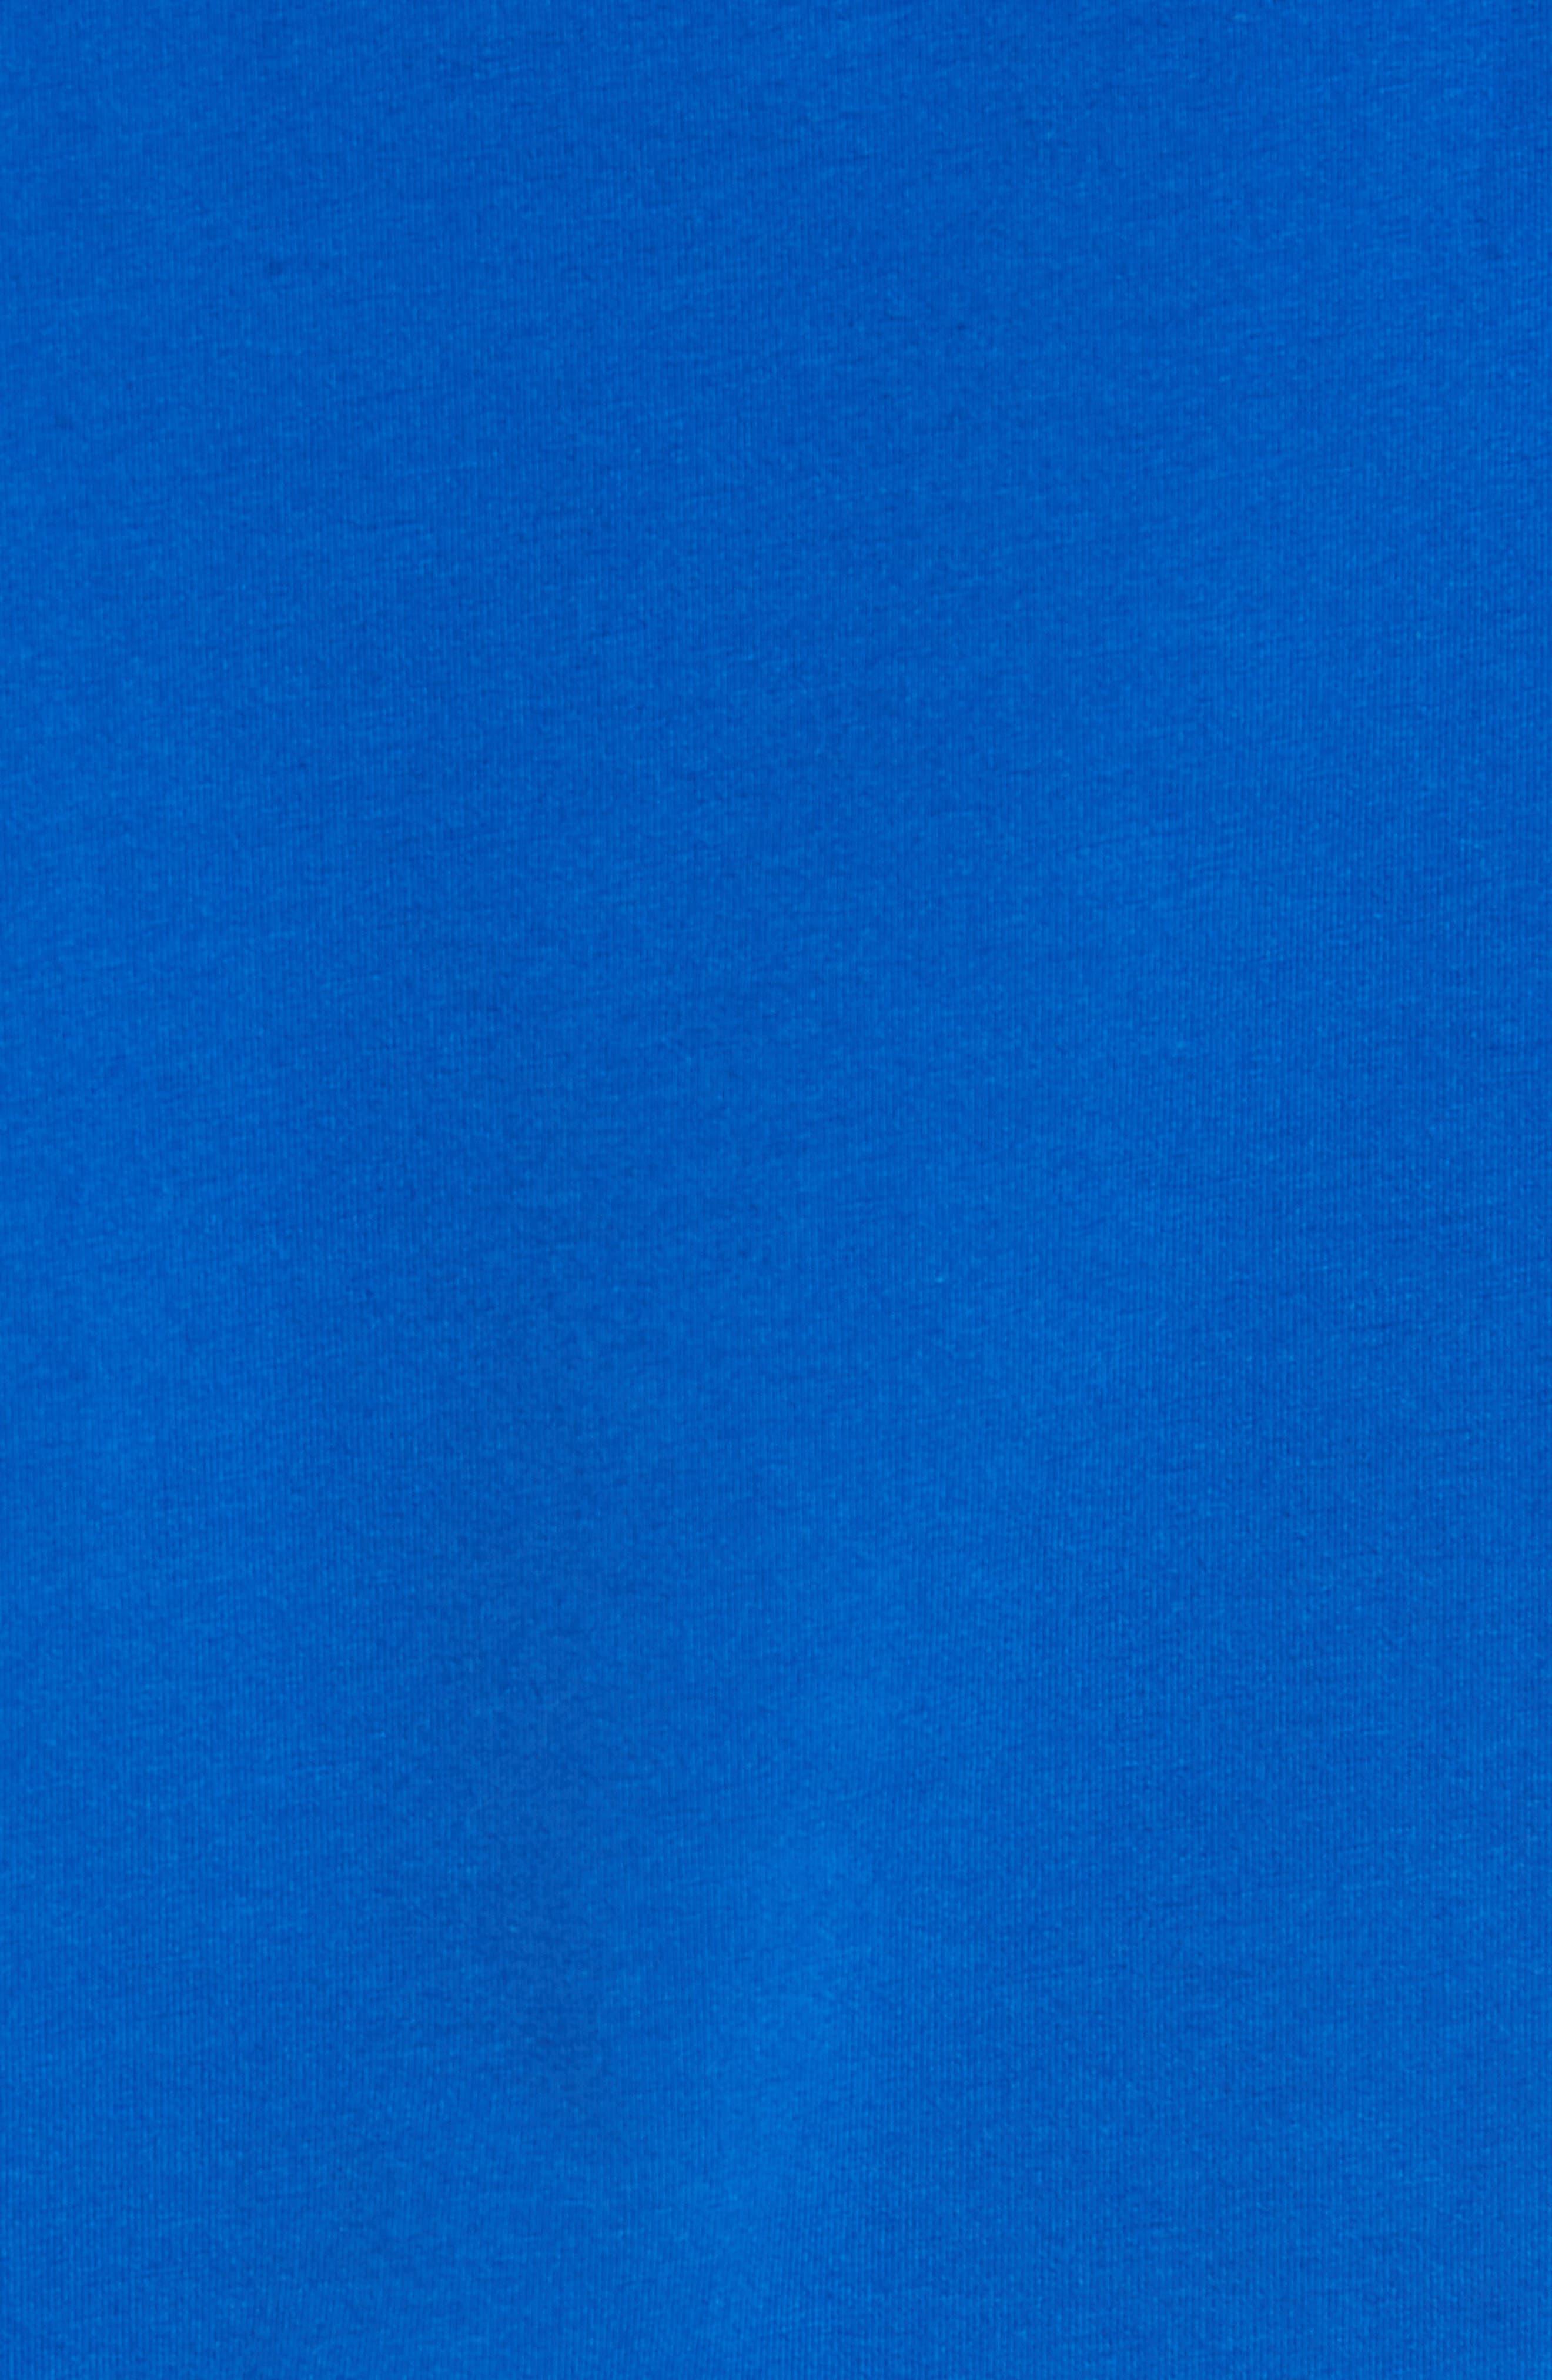 Unstoppable Short Sleeve Hoodie,                             Alternate thumbnail 5, color,                             SQUADRON / WHITE